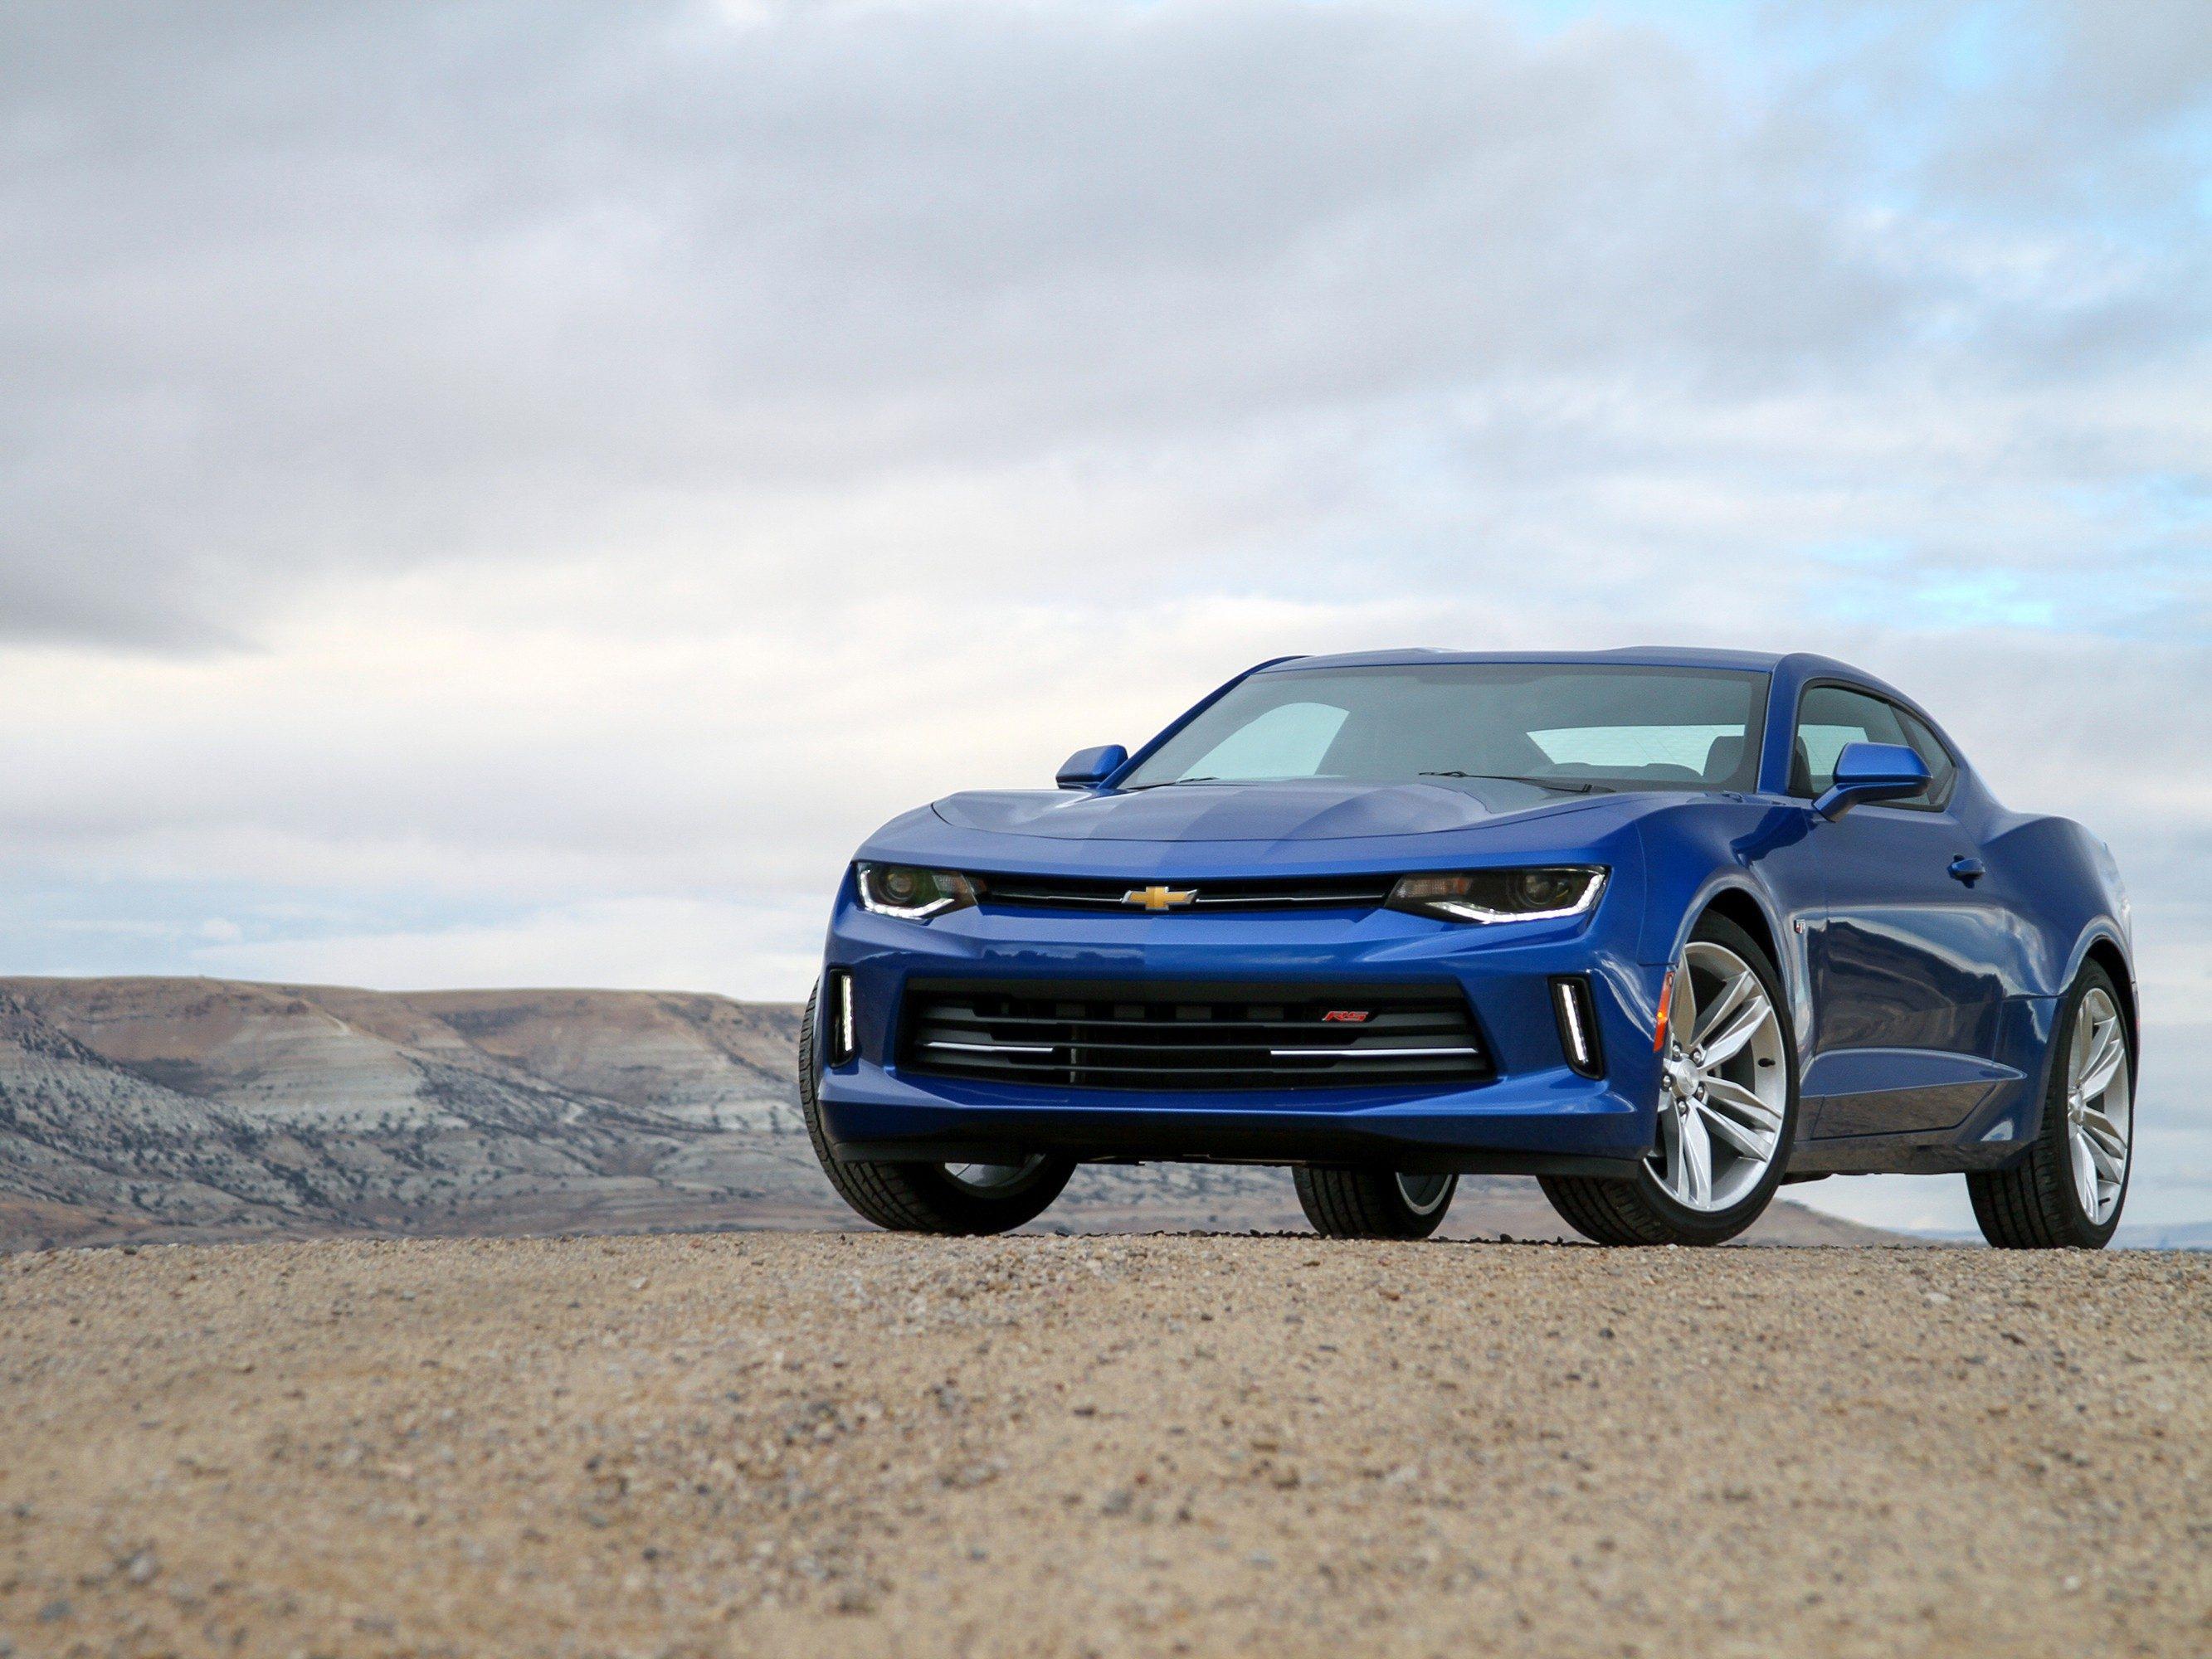 1. The 2016 Chevrolet Camaro is more nimble.